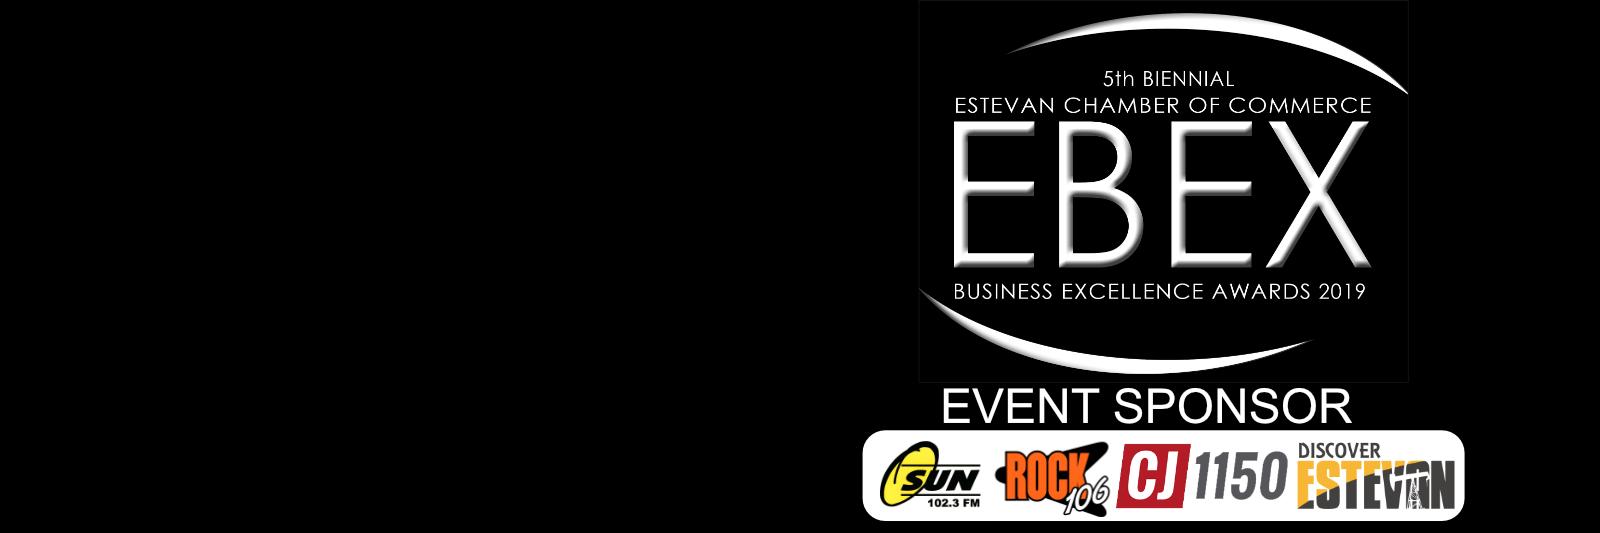 Website-Banner-EBEX-2019-2.jpg